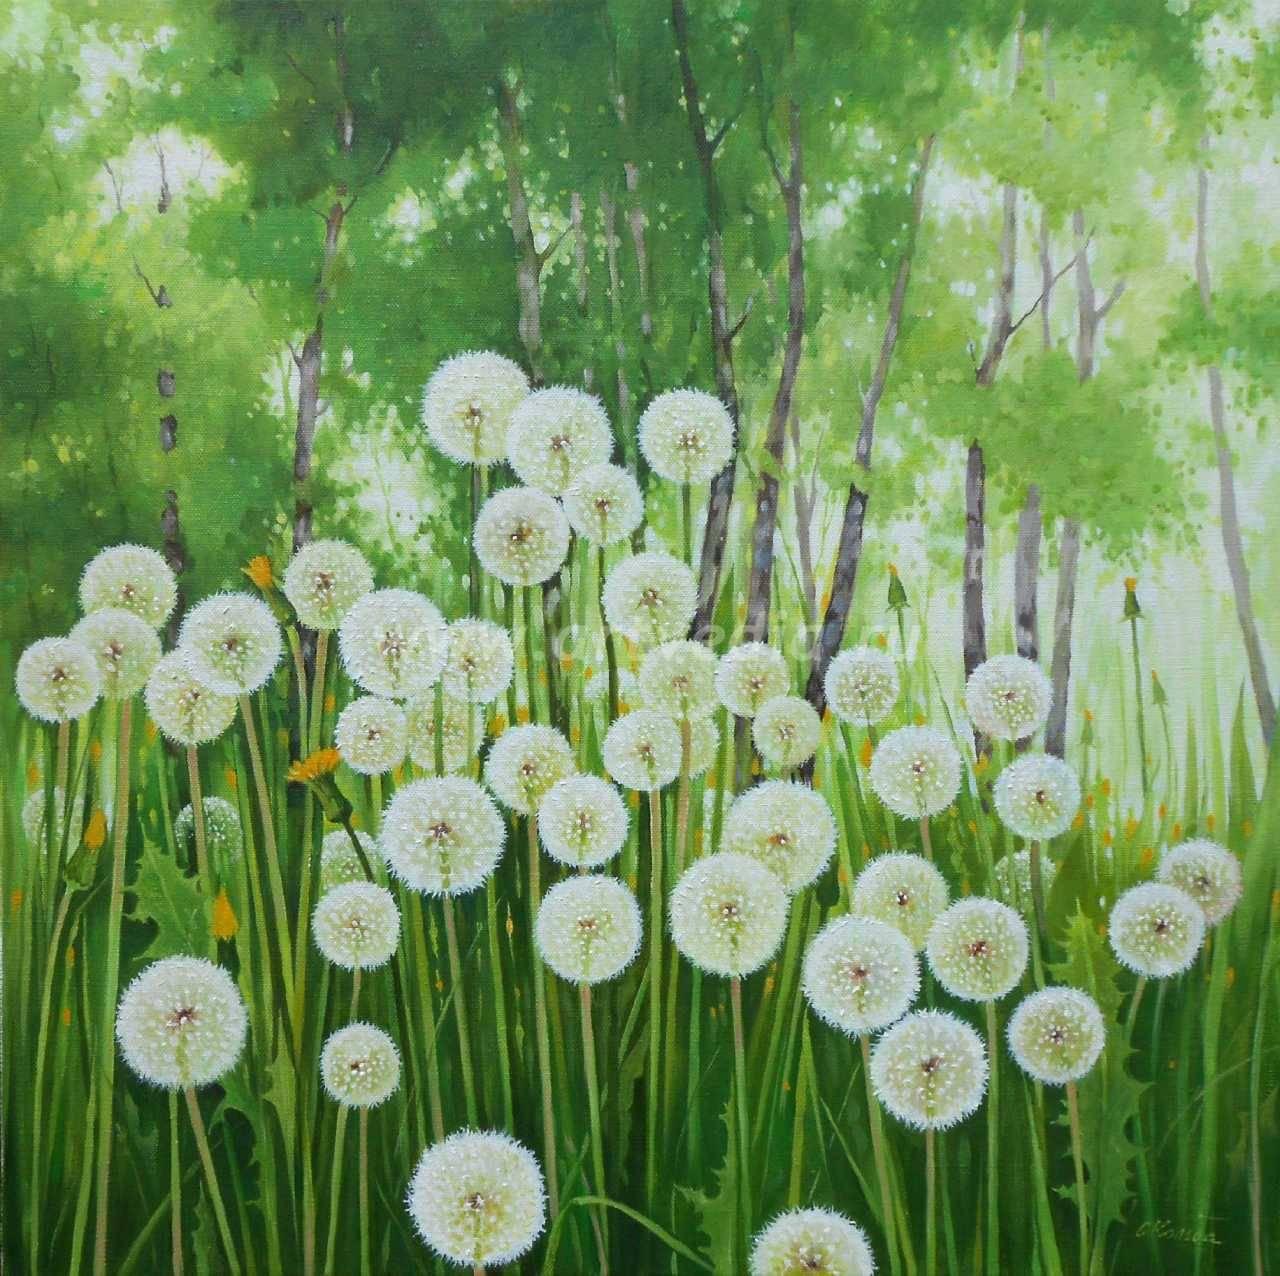 весенний пейзаж с одуванчиками